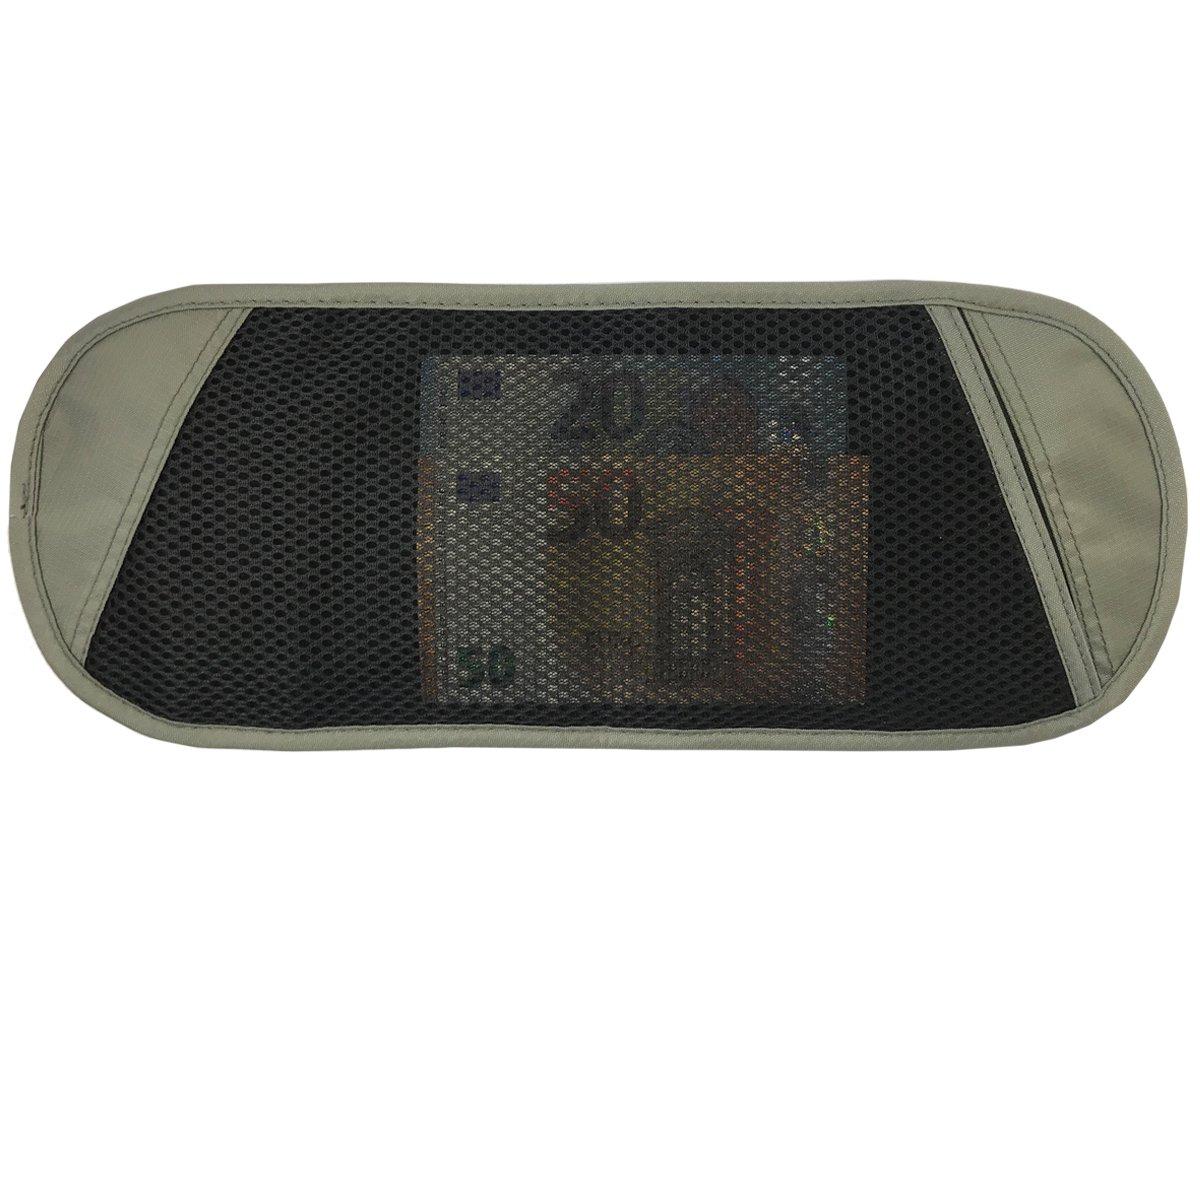 PREMYO XL Money Belt Travel Wallet Anti-Theft Waist Bag Women Men RFID Protection Hidden for Passport Cash Keys Slim Waterproof Flat 2 Straps Black